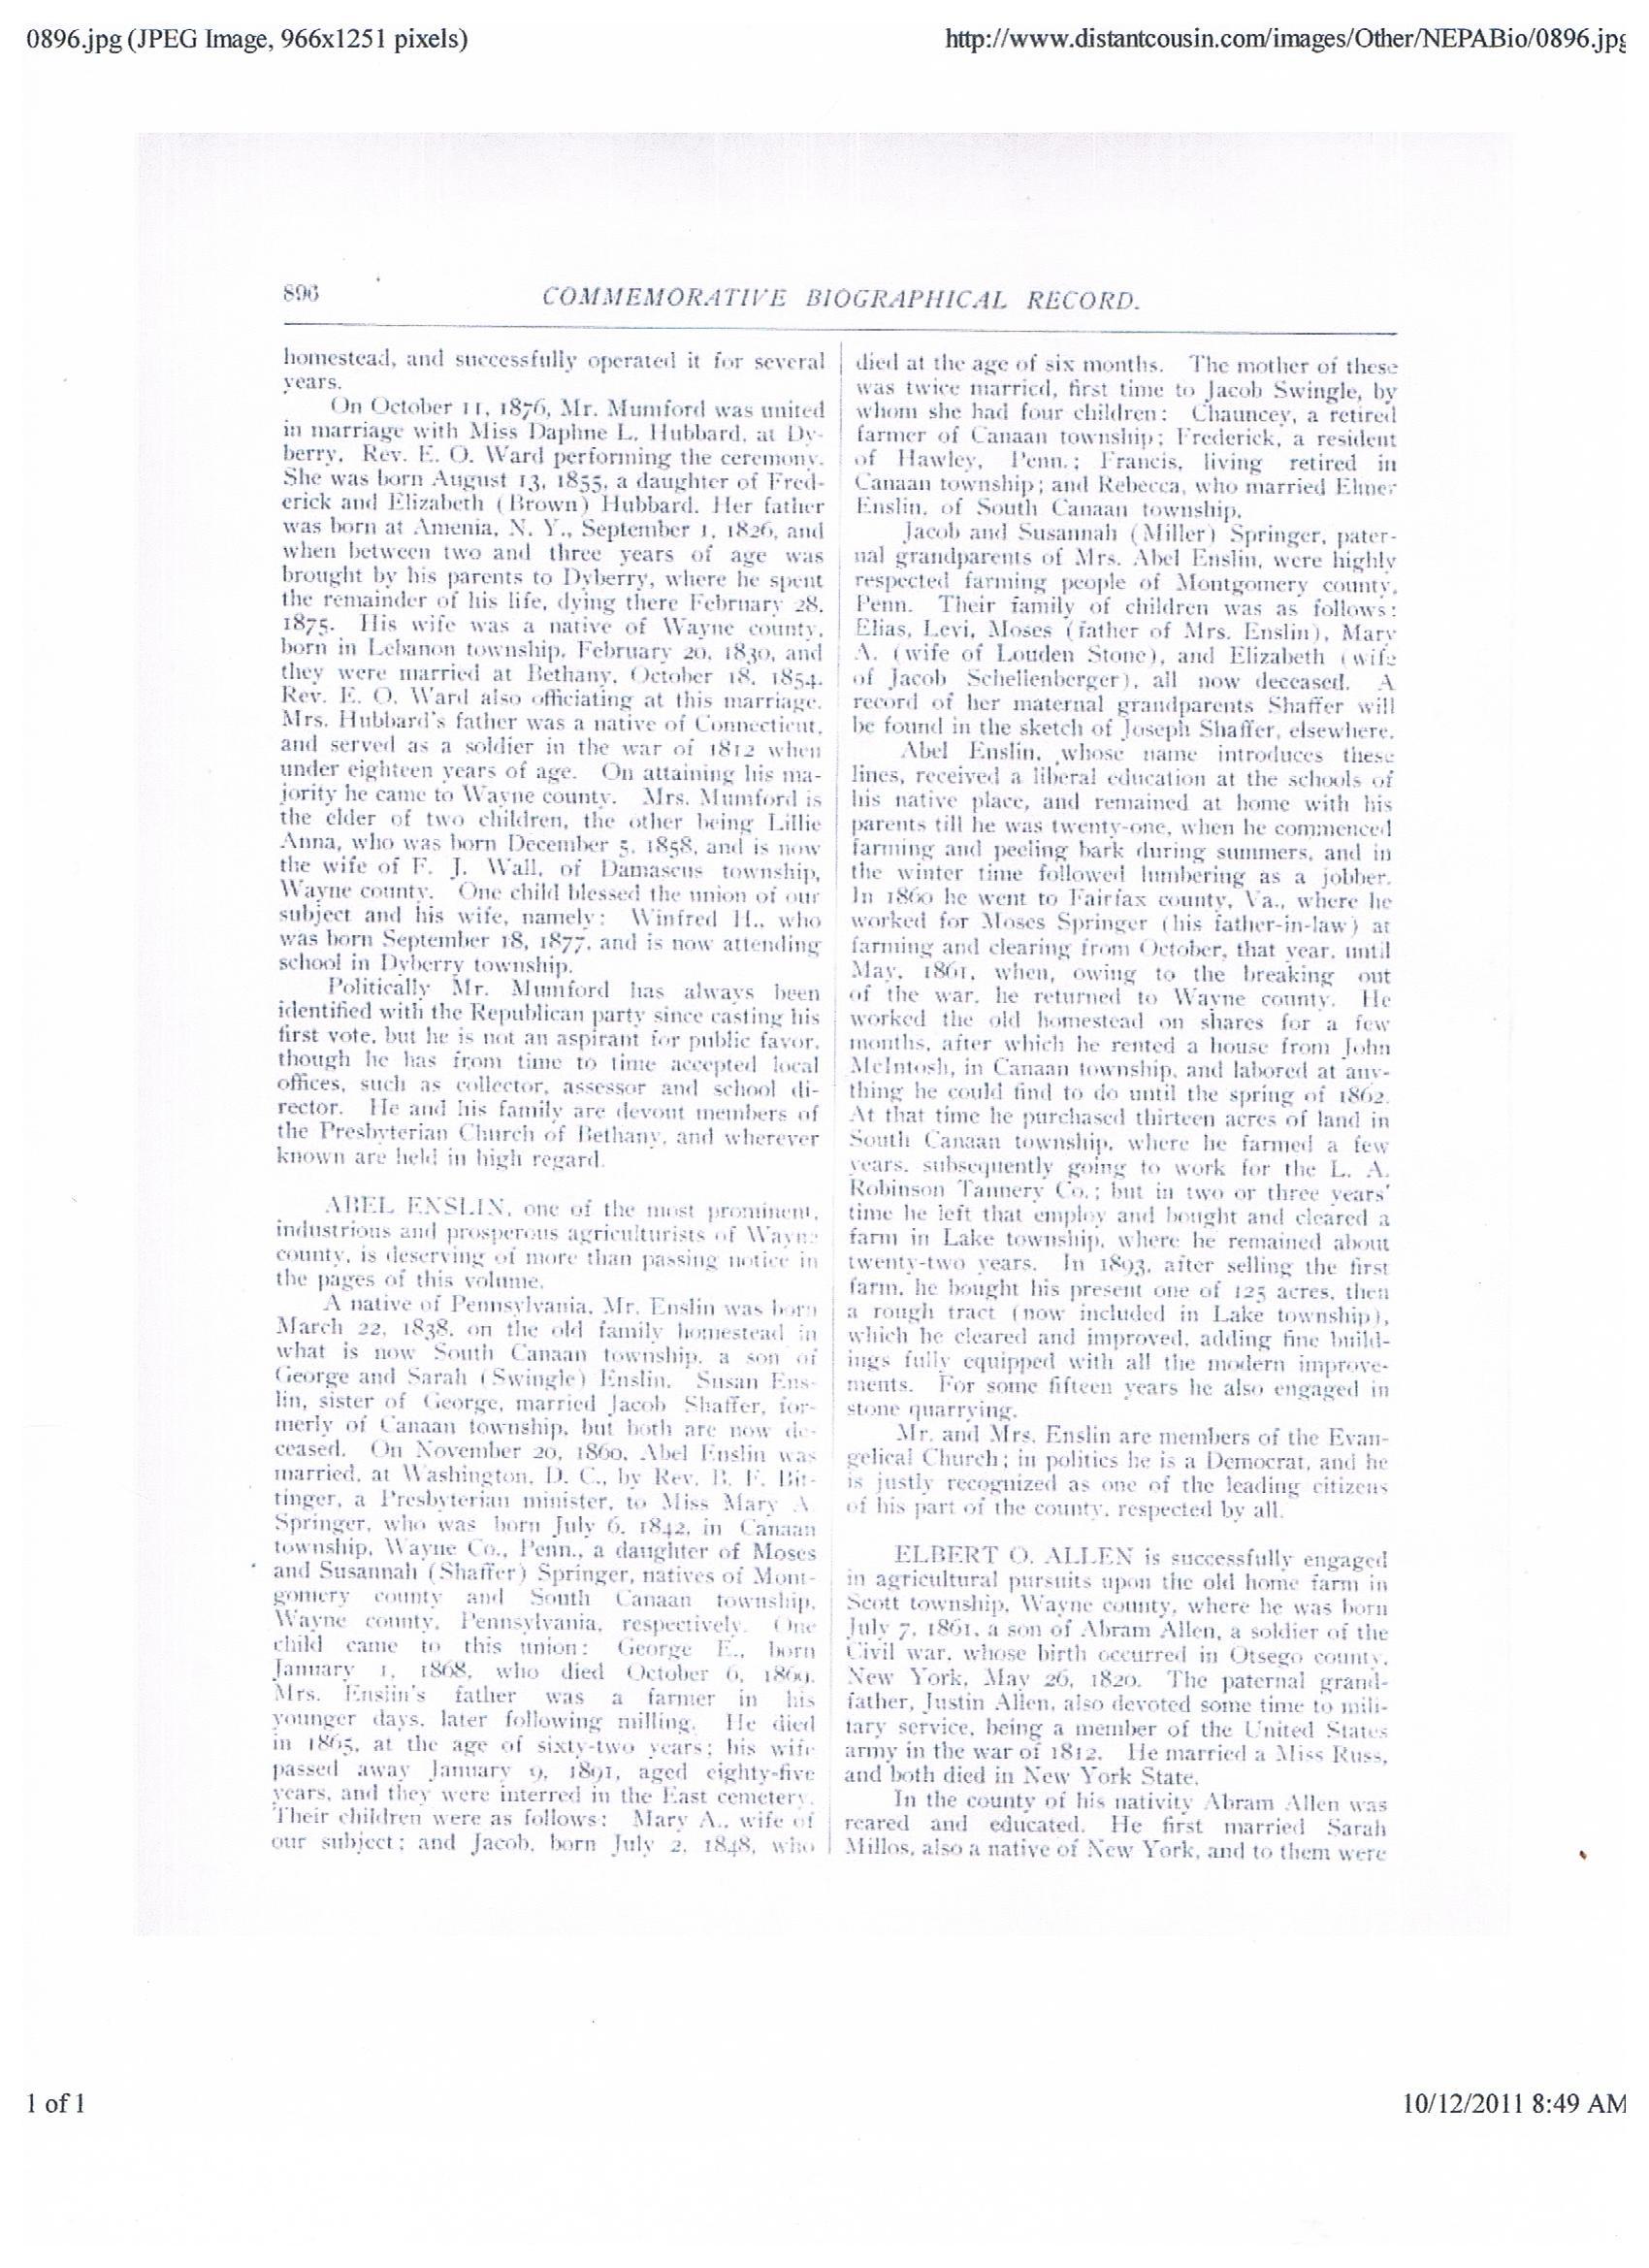 George W. of Catherine Swingle/George Enslin